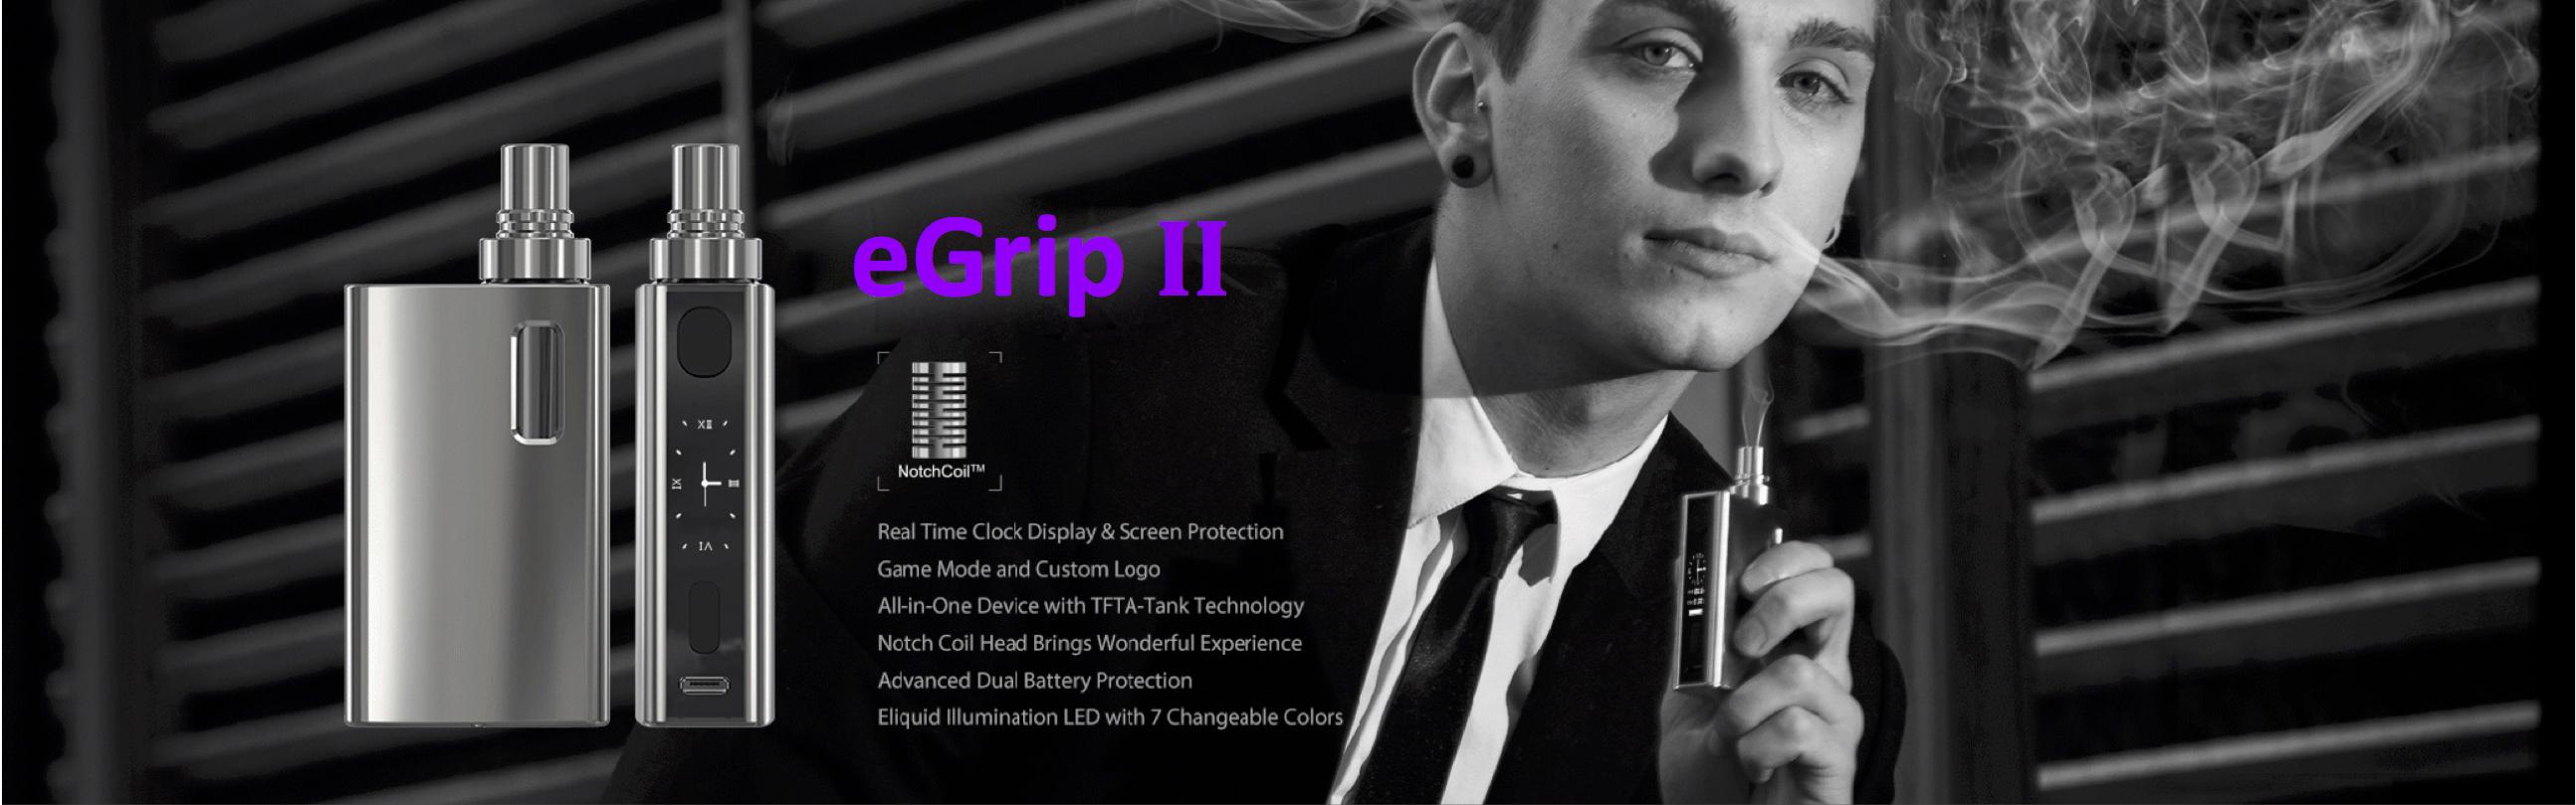 EGRIP_II_WEB_BANNER__1